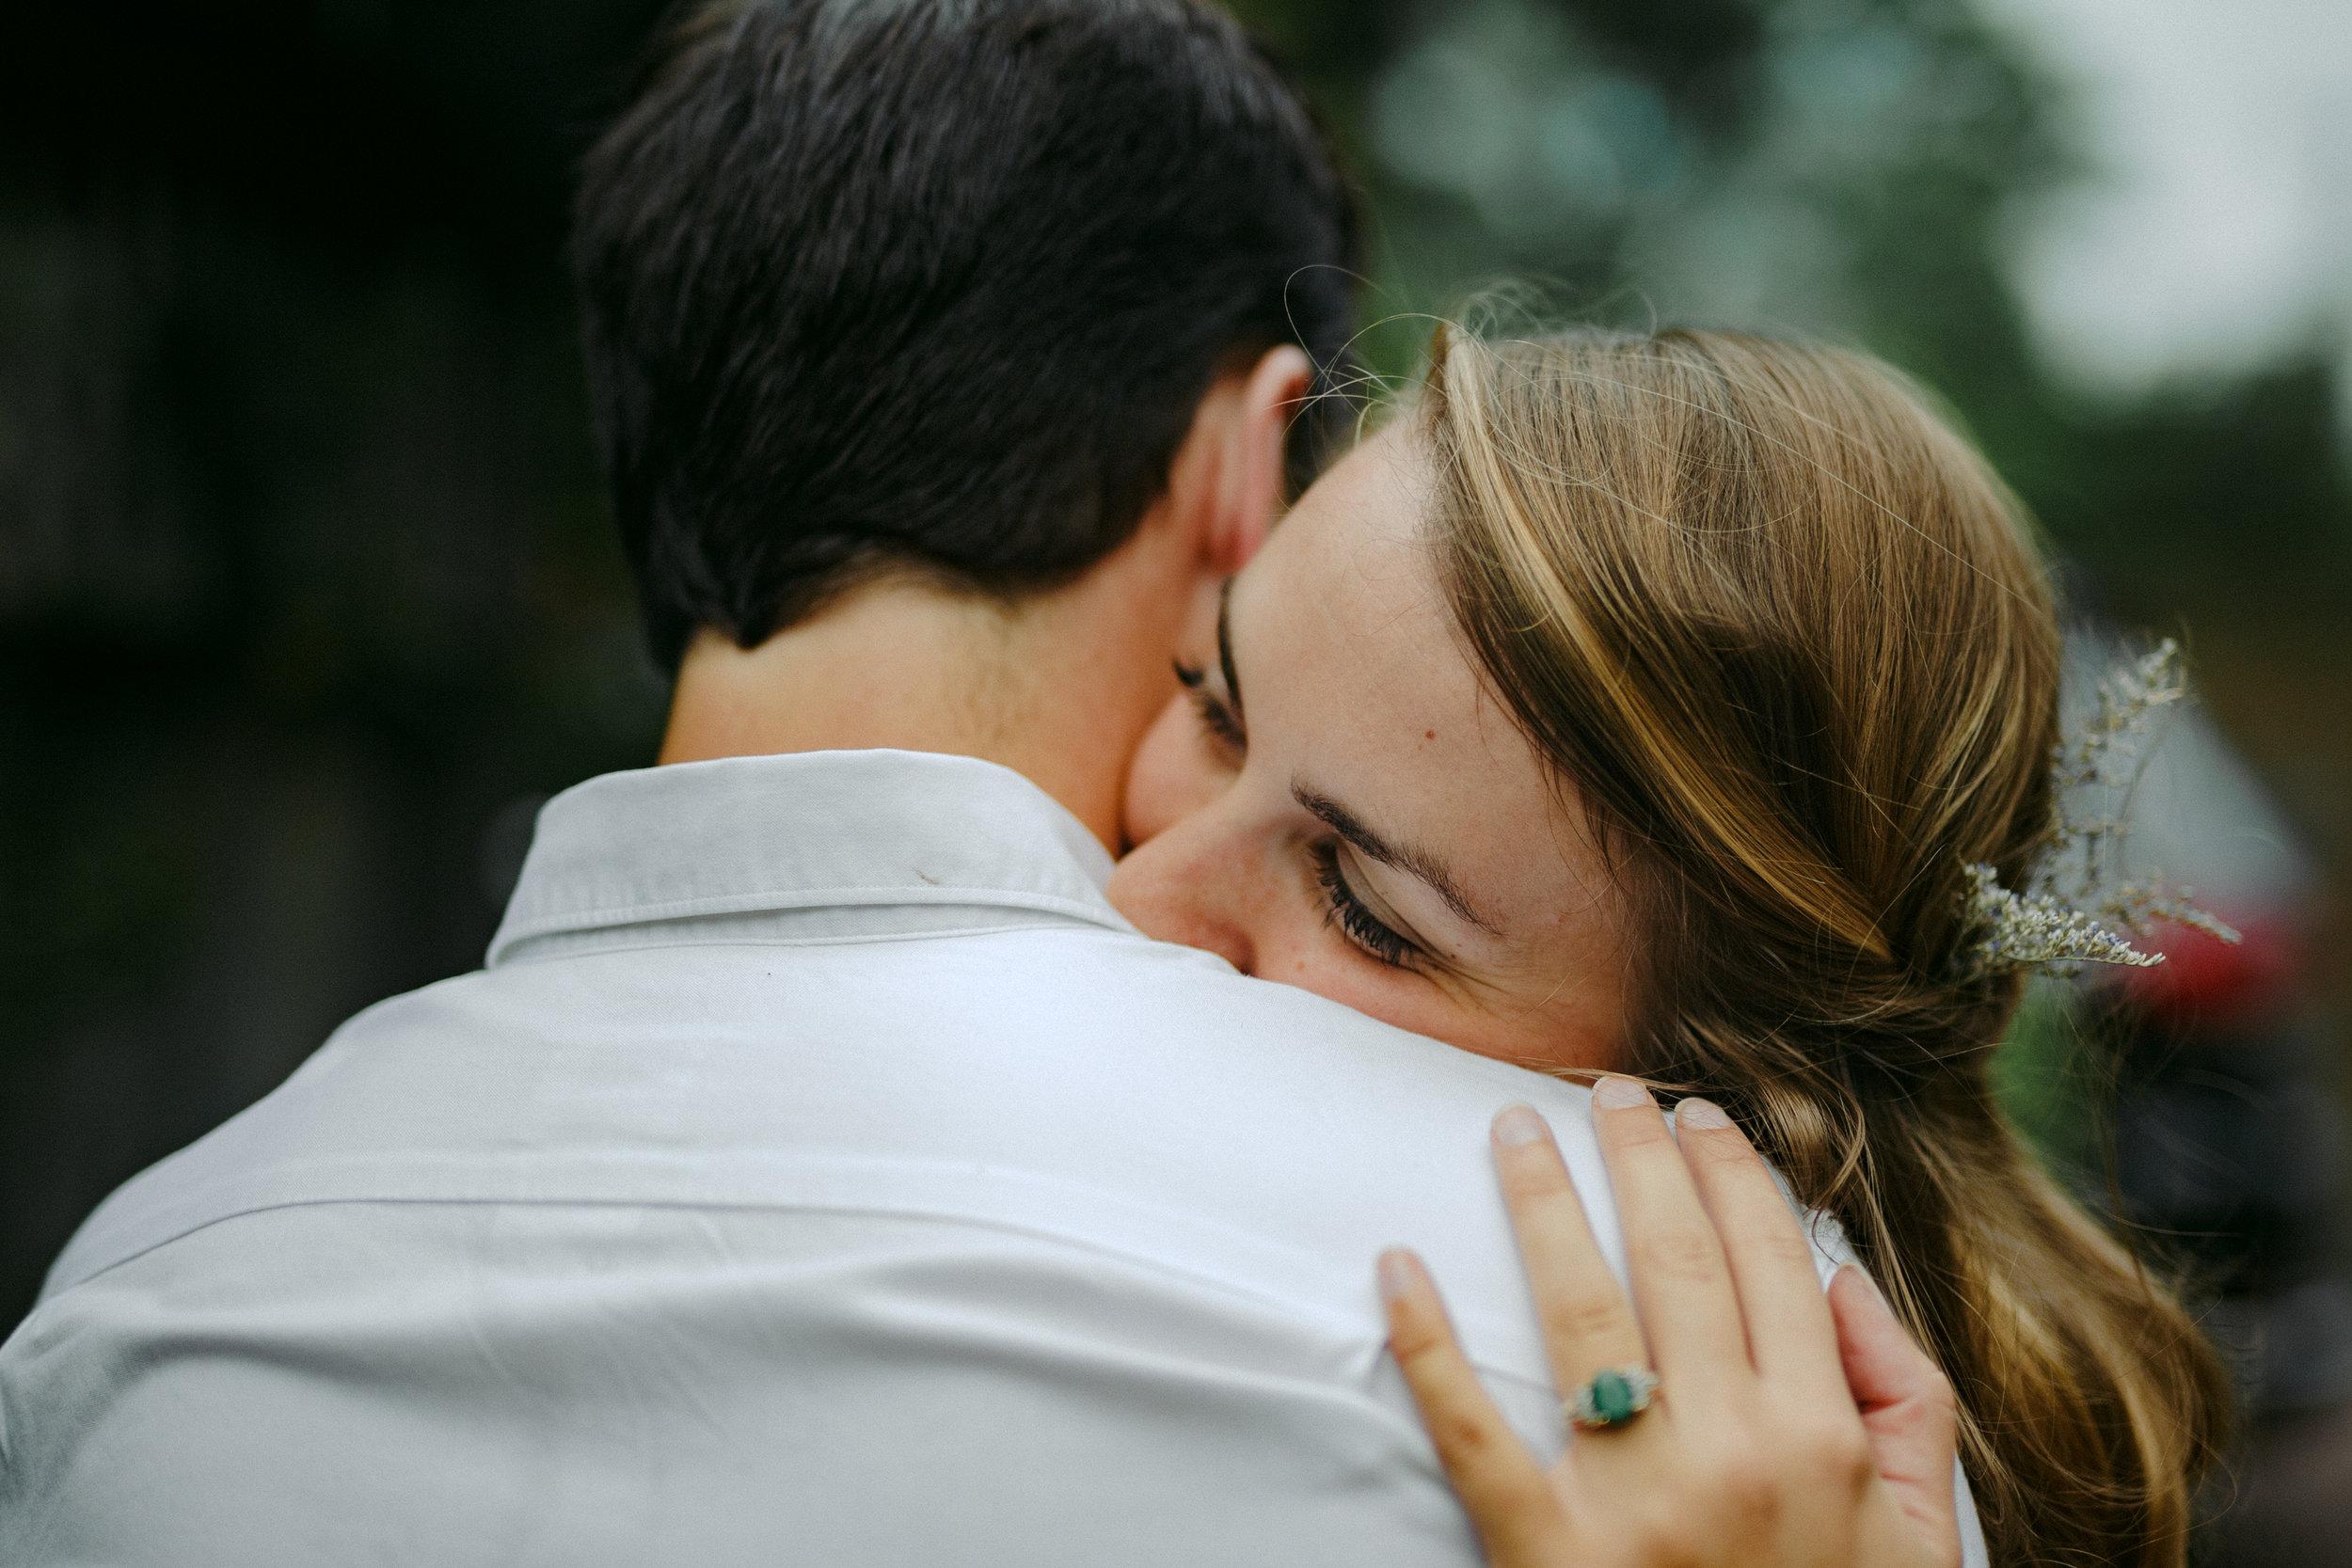 richmond_wedding_photographer-5.jpg